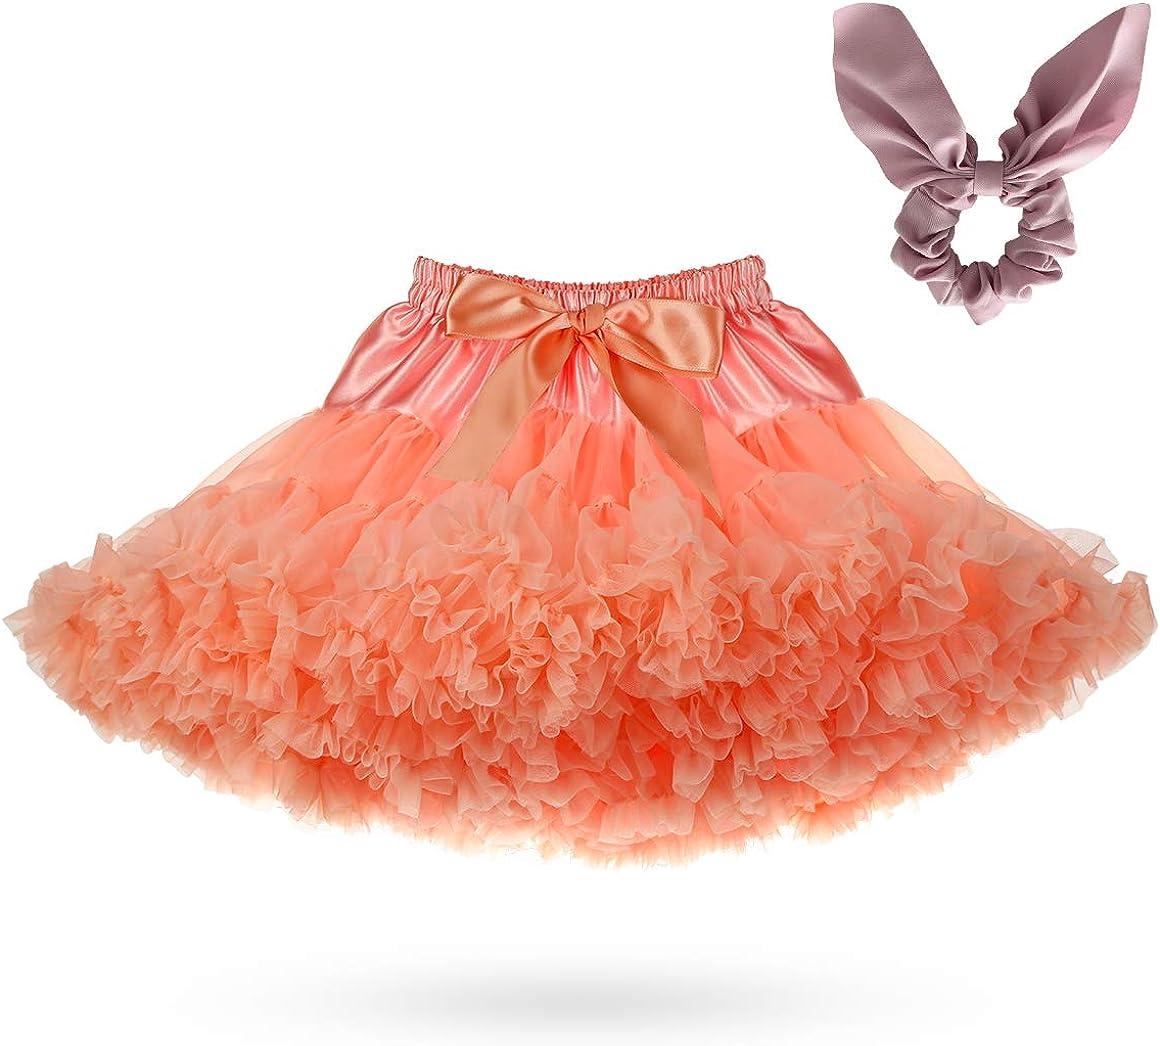 Gelma Baby Girls Tutu Skirt Princess Fluffy Soft Tulle Ballet Birthday Party Dance Pettiskirt Tiered, Coralred